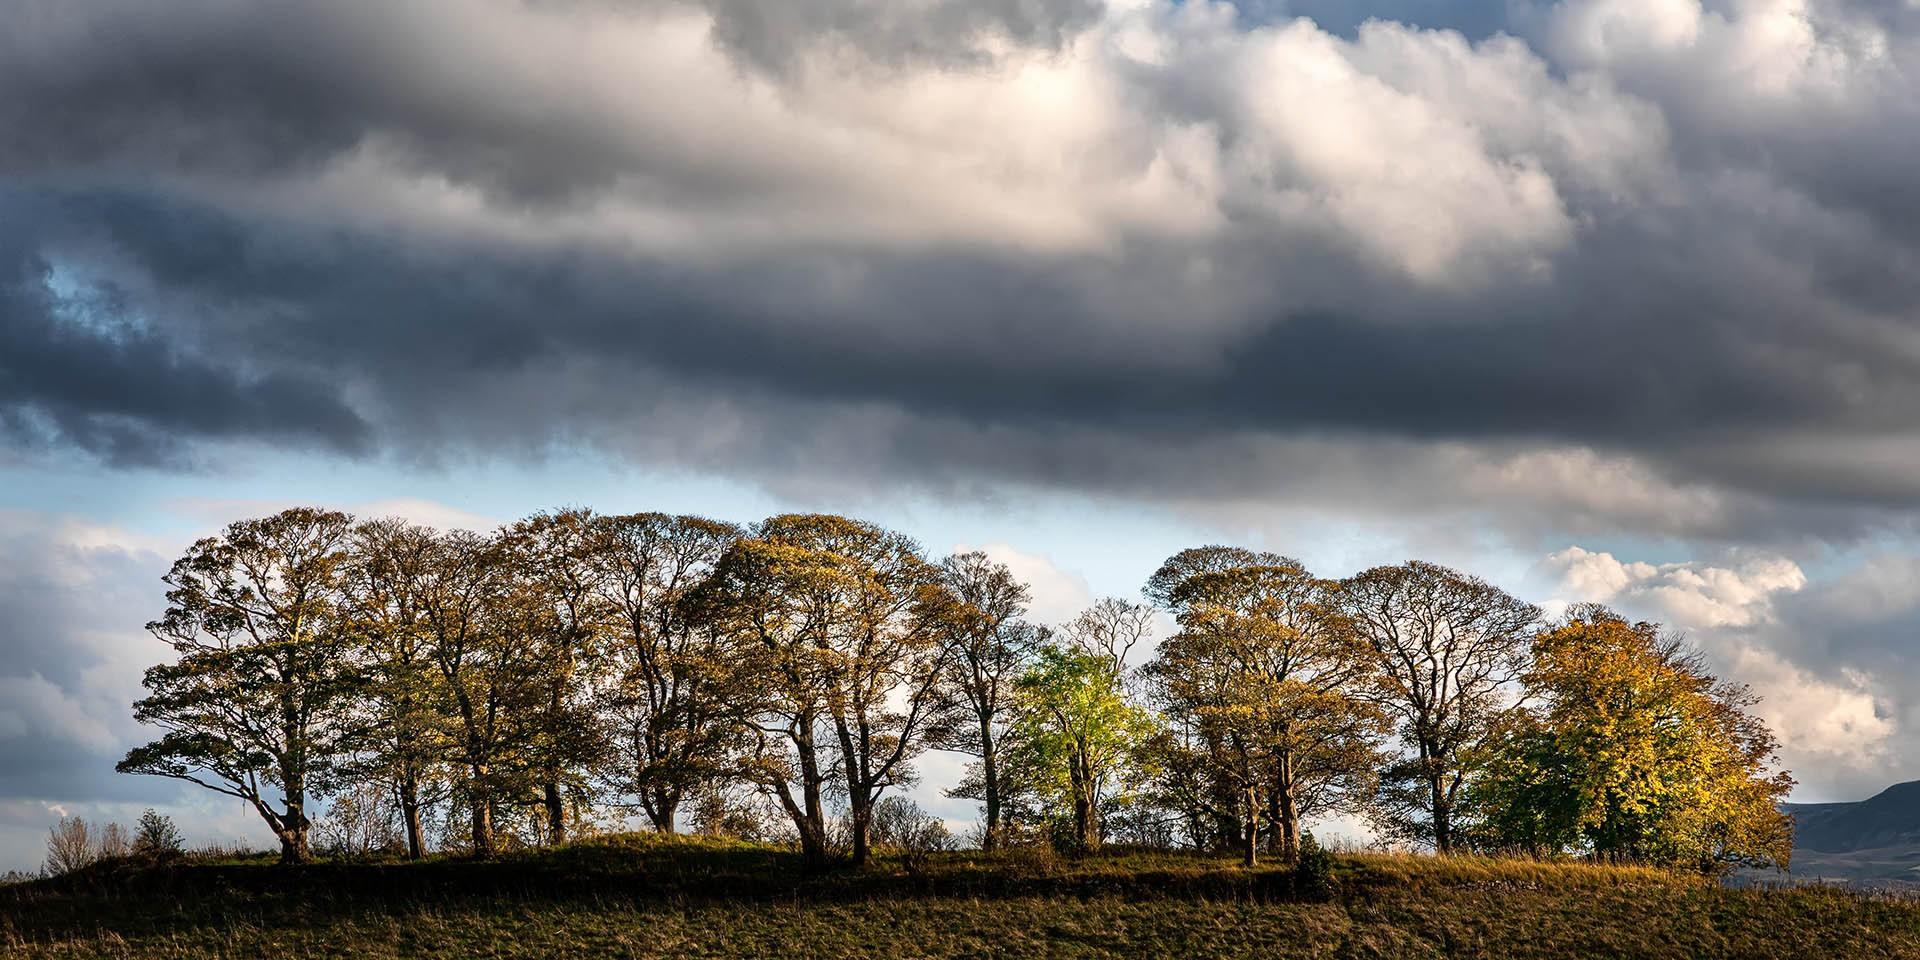 Norman Dodds - Cammo Landscape